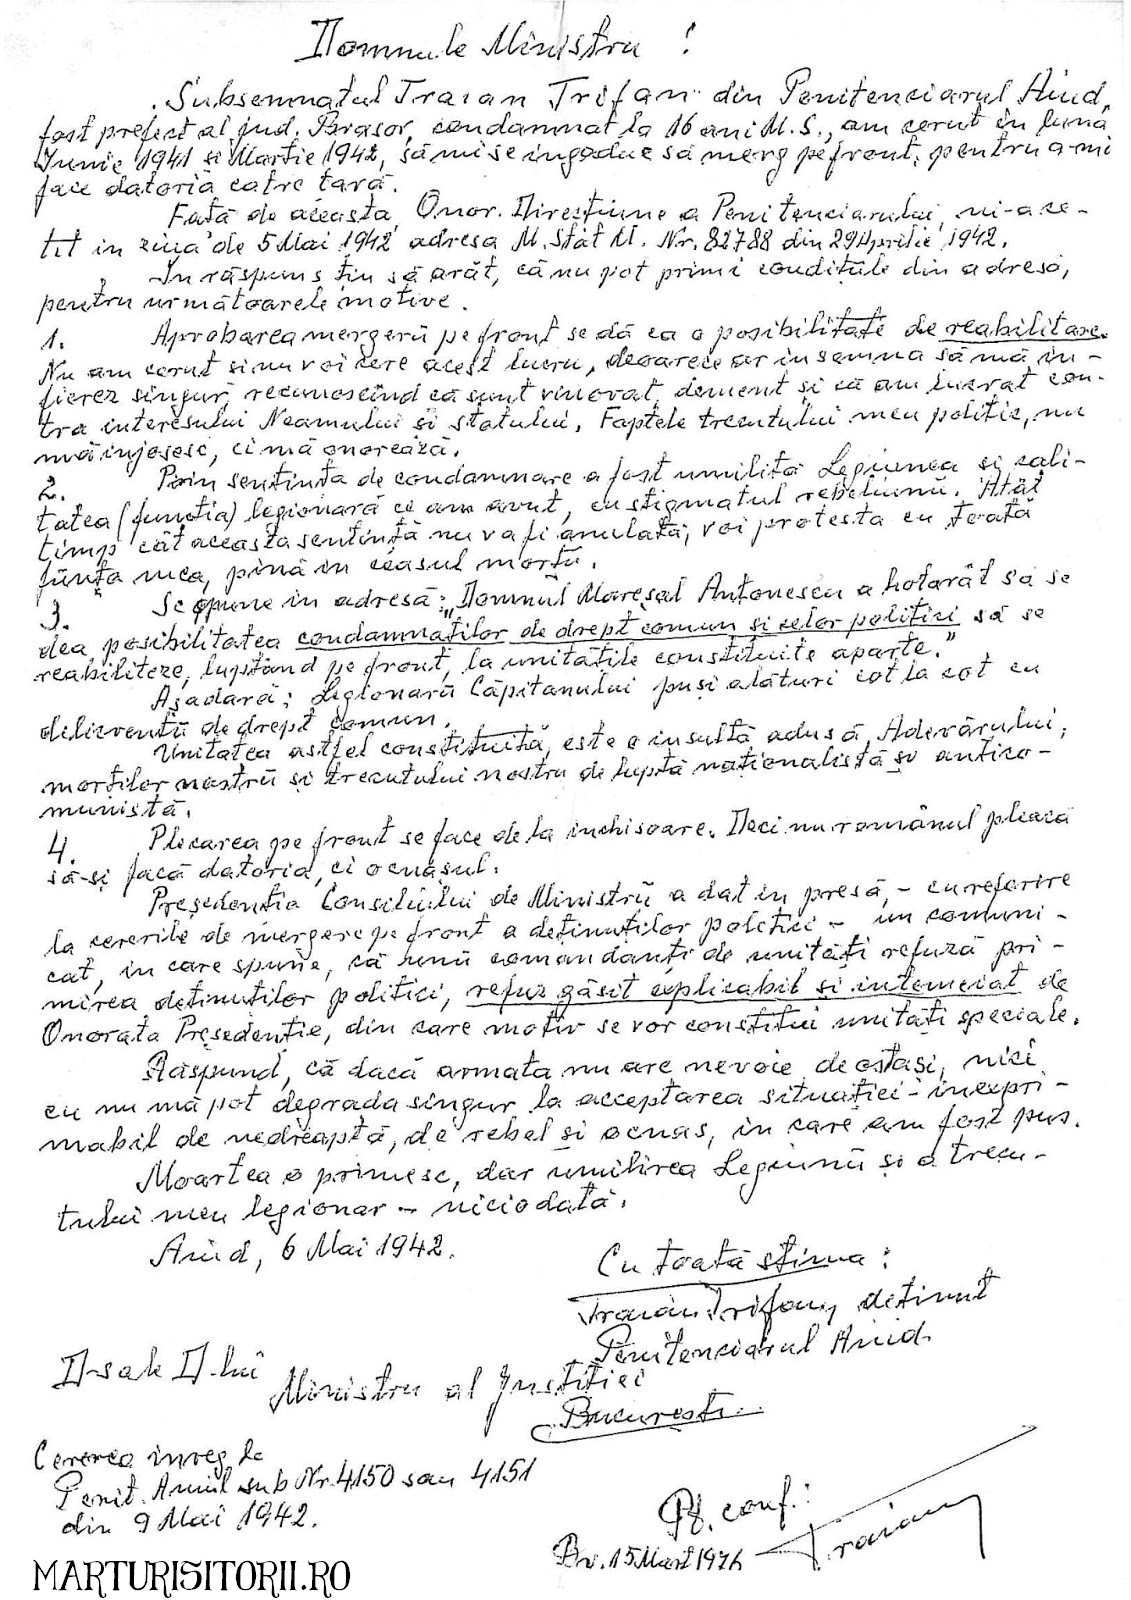 Traian Trifan - Scrisoare Olografa din Penitenciarul Aiud 6 Mai 1942 MARTURISITORII RO